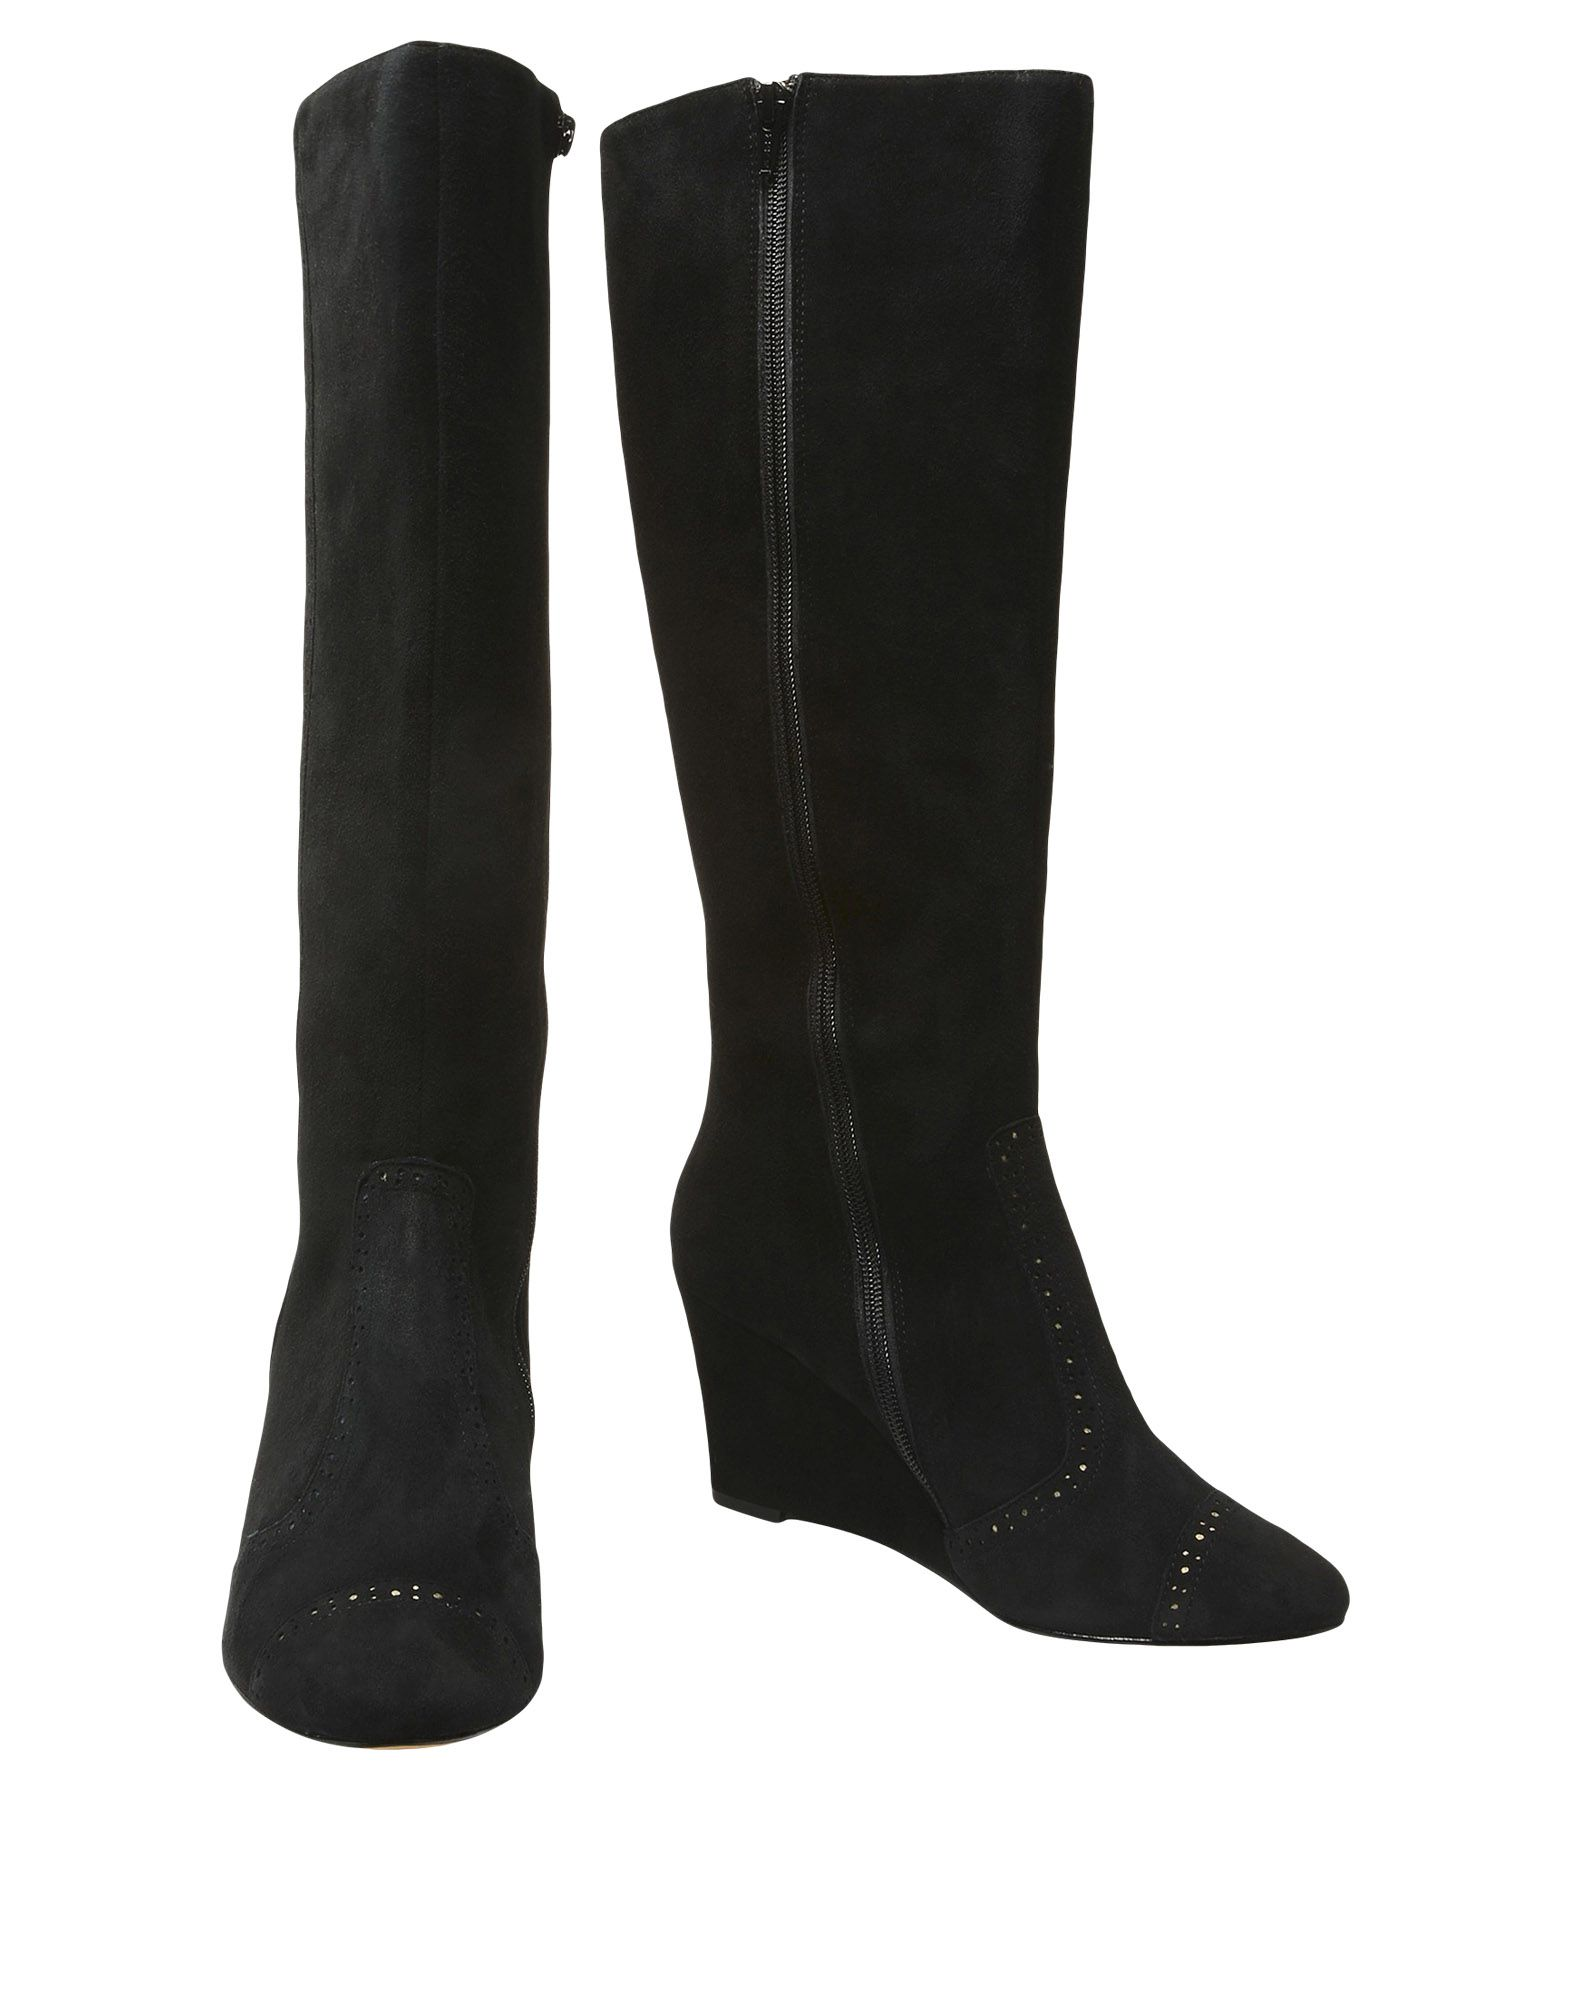 Lucy Choi London Stiefel Damen 11446254XJGut  11446254XJGut Damen aussehende strapazierfähige Schuhe ed8636